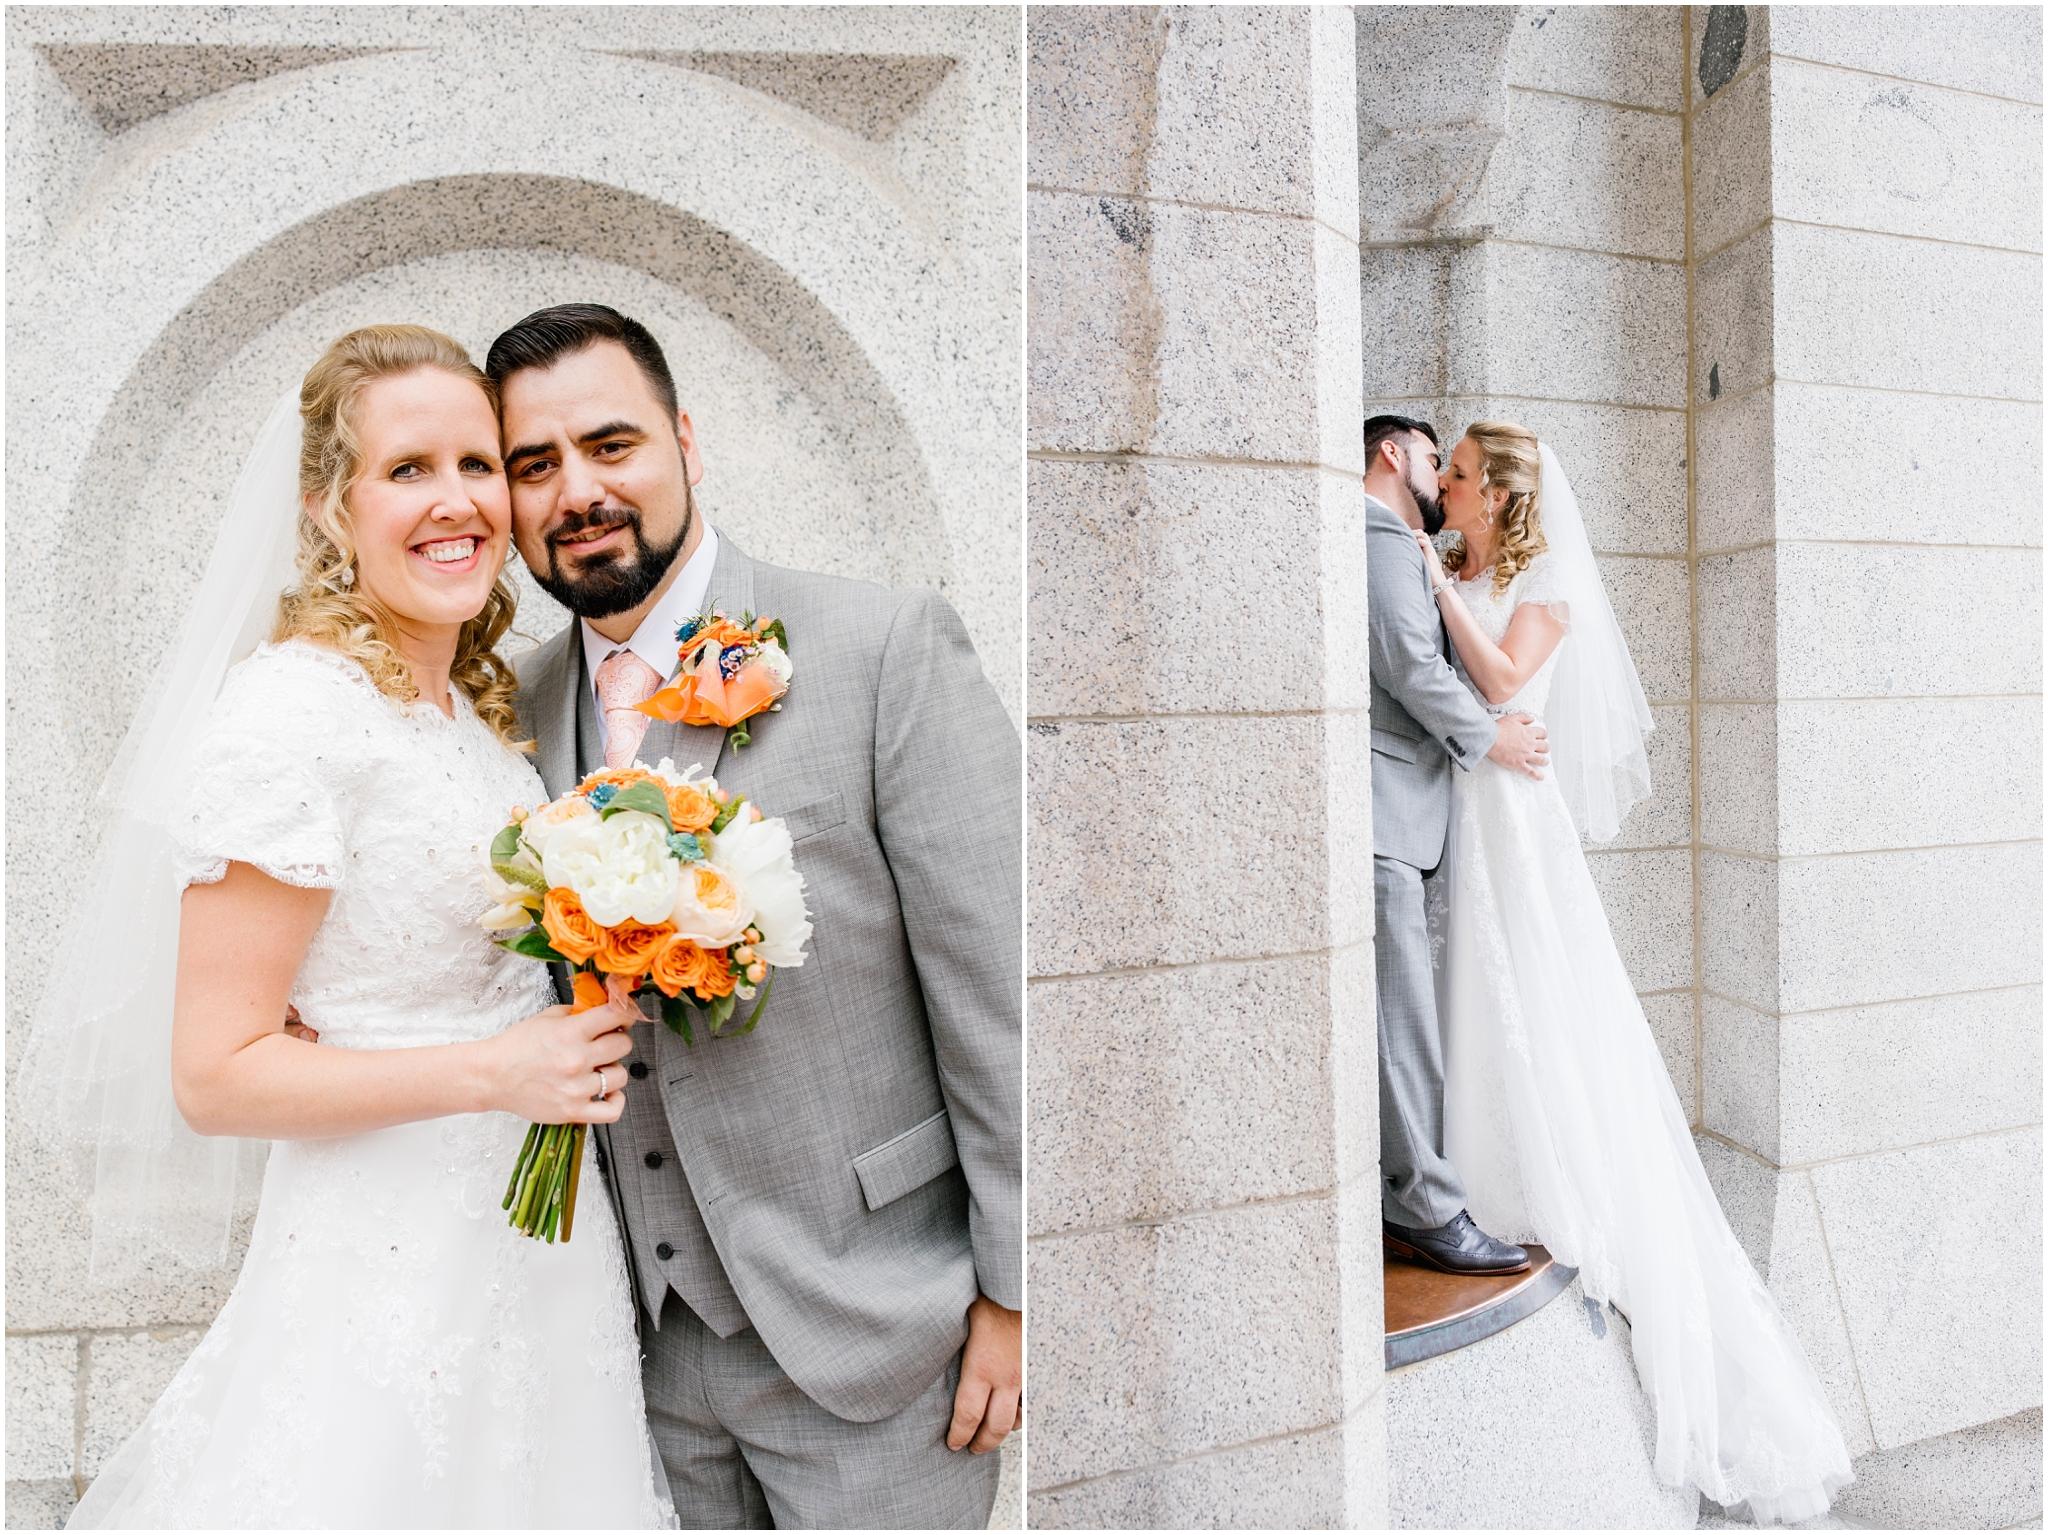 Justin and Melissa-121_Lizzie-B-Imagery-Utah-Wedding-Photographer-Salt-Lake-City-Temple-Park-City-Joseph-Smith-Memorial-Building.jpg